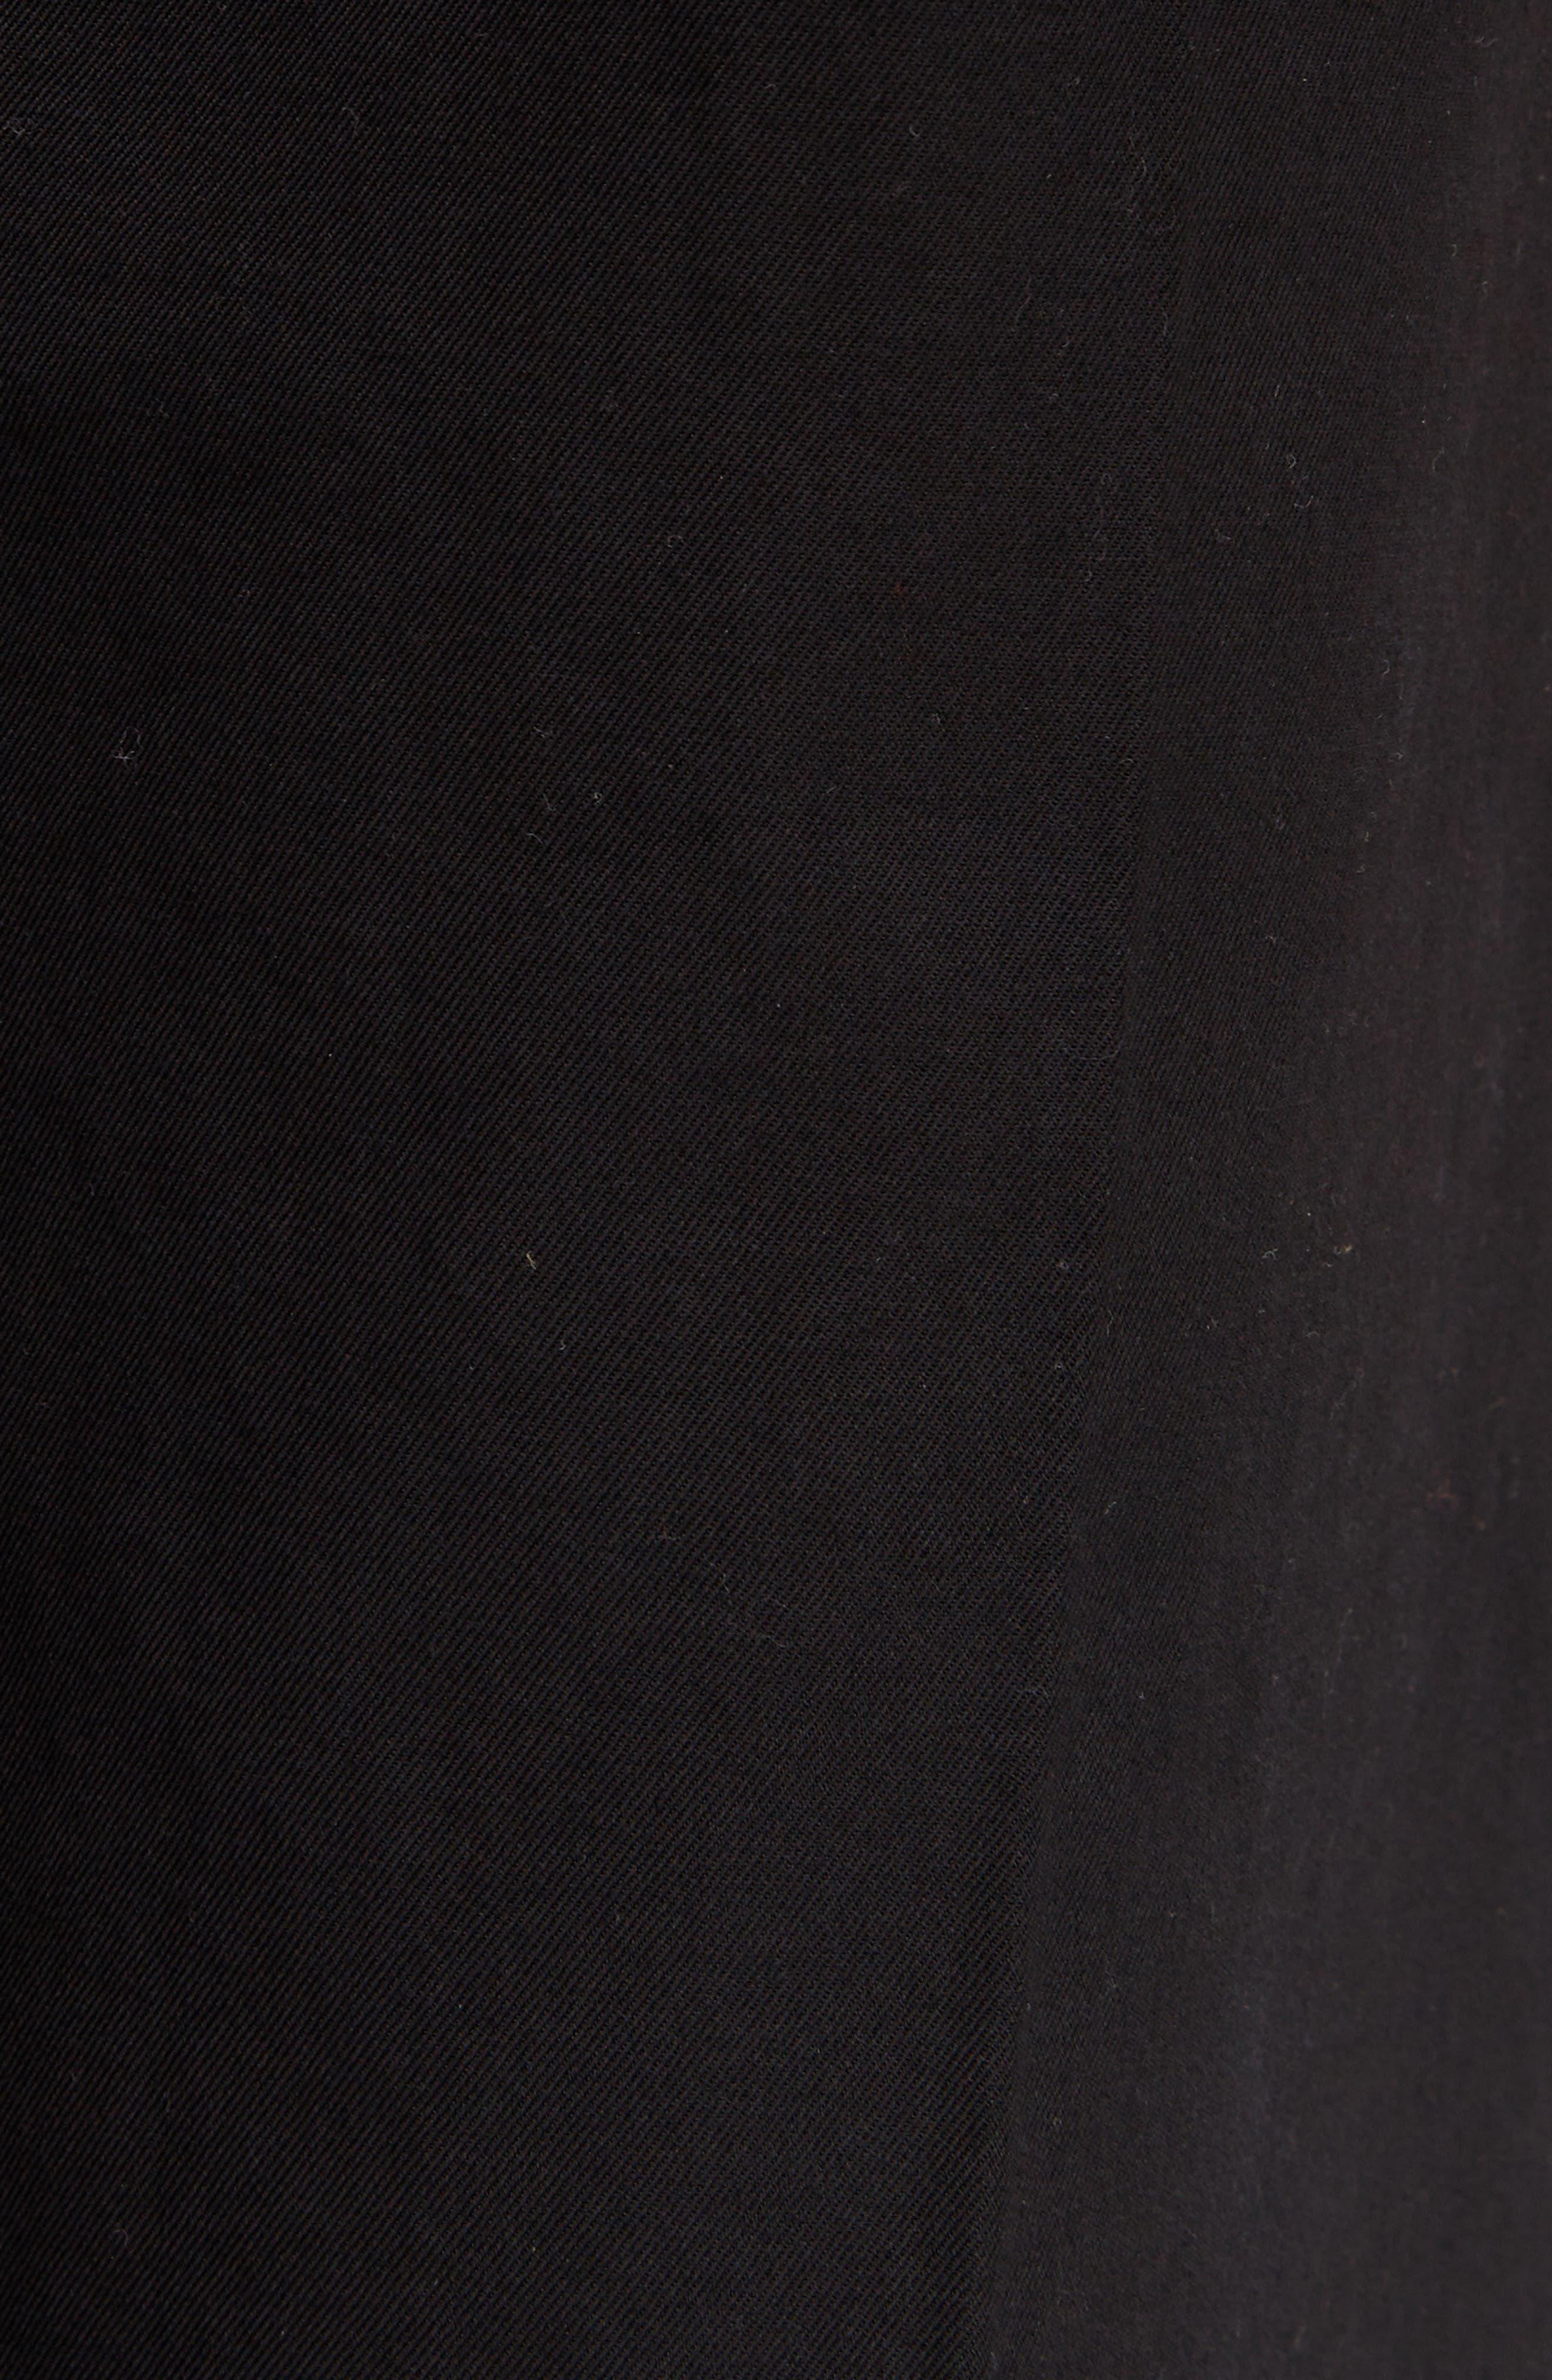 Madya Cuffed Cotton Pants,                             Alternate thumbnail 9, color,                             Black